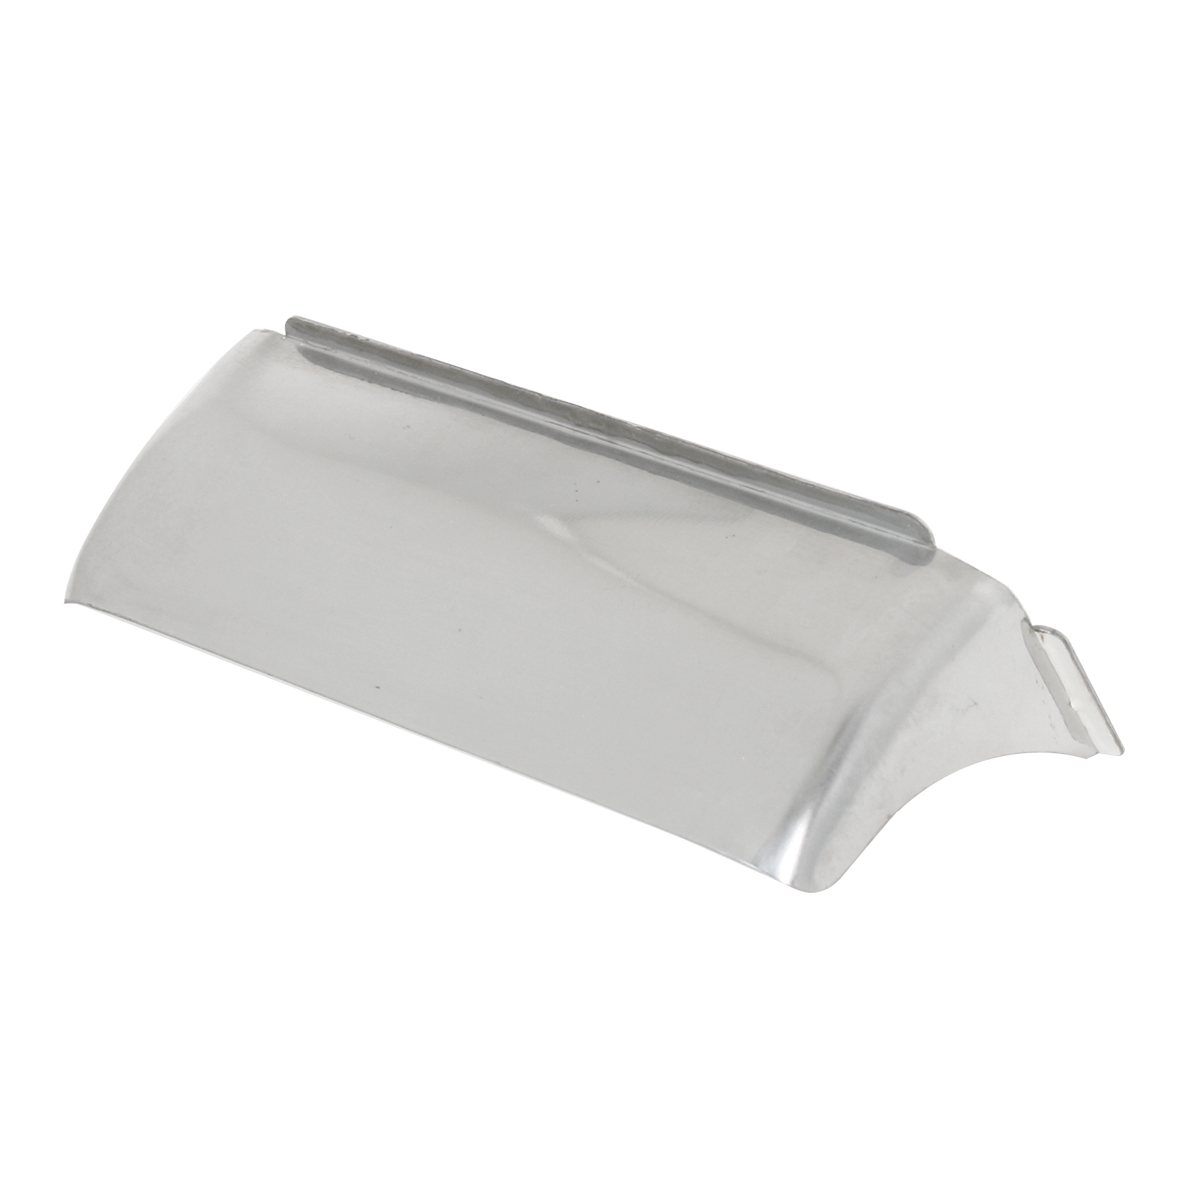 92491 Dual Rectangular Headlight Visor with Curve